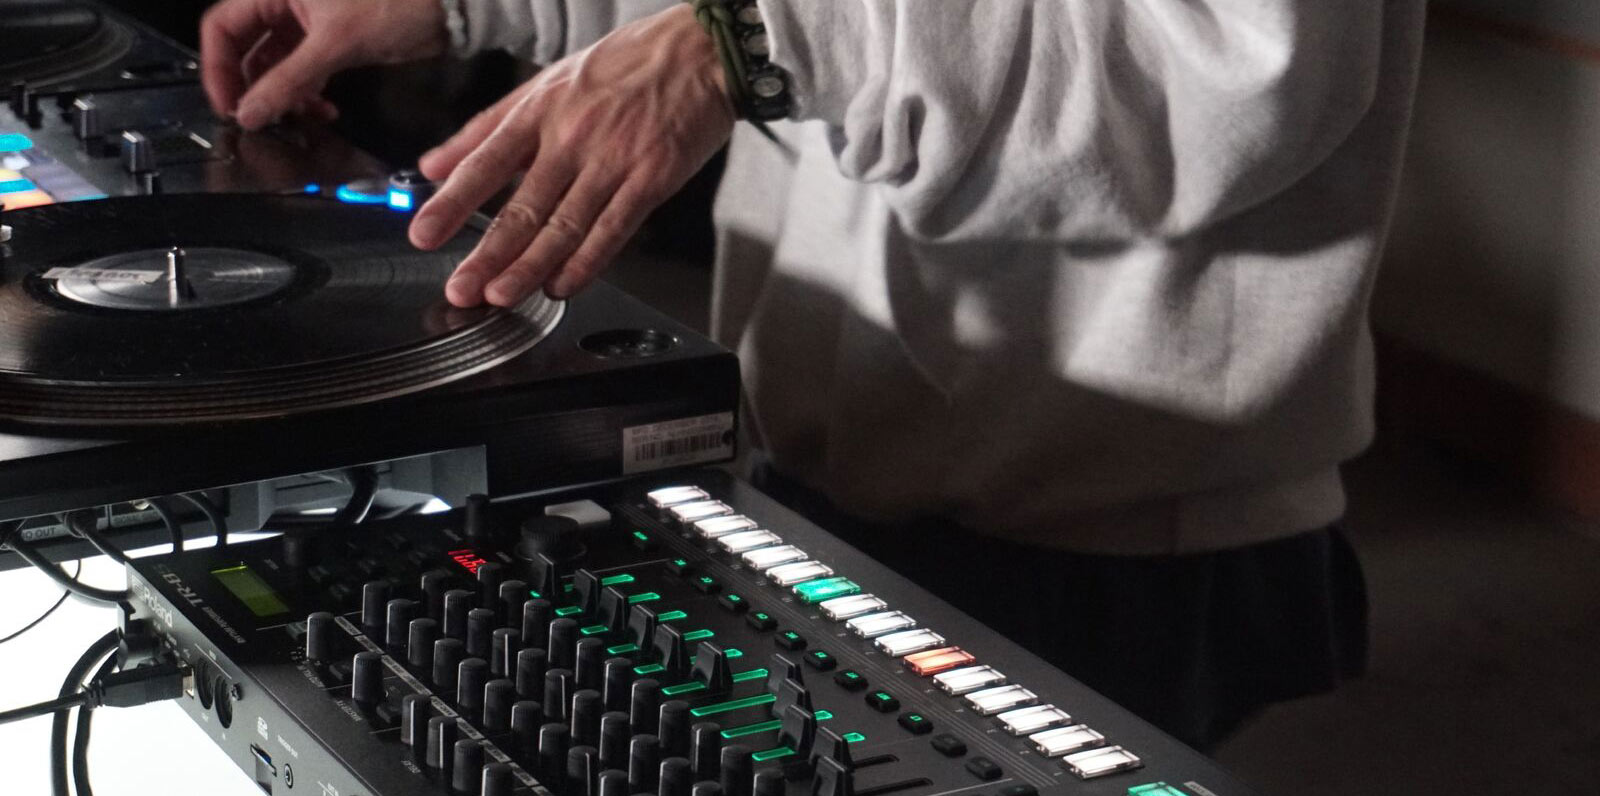 Roland - RESET THE DJ SET